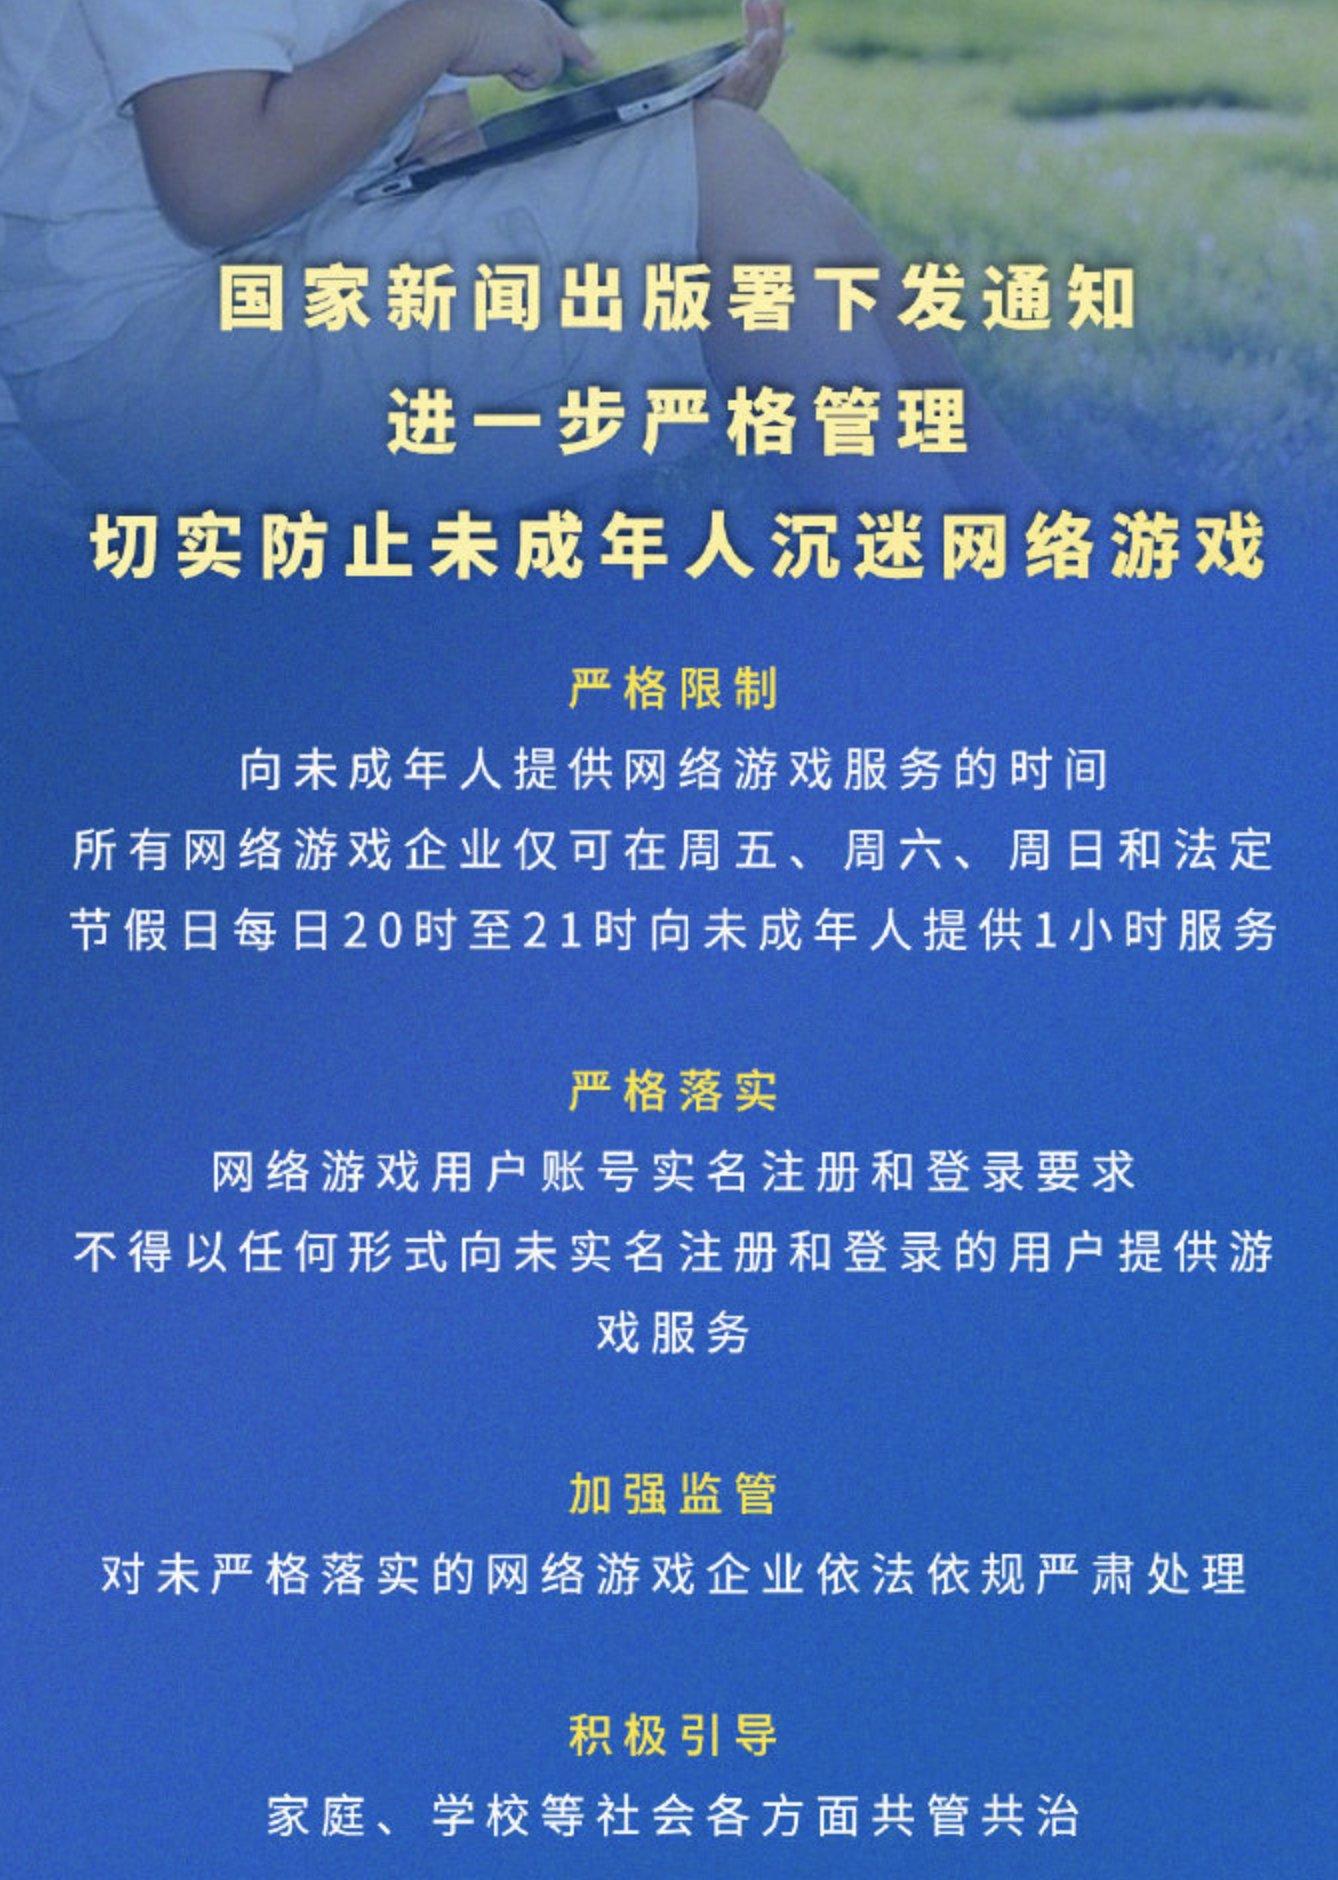 China Gaming Restriction